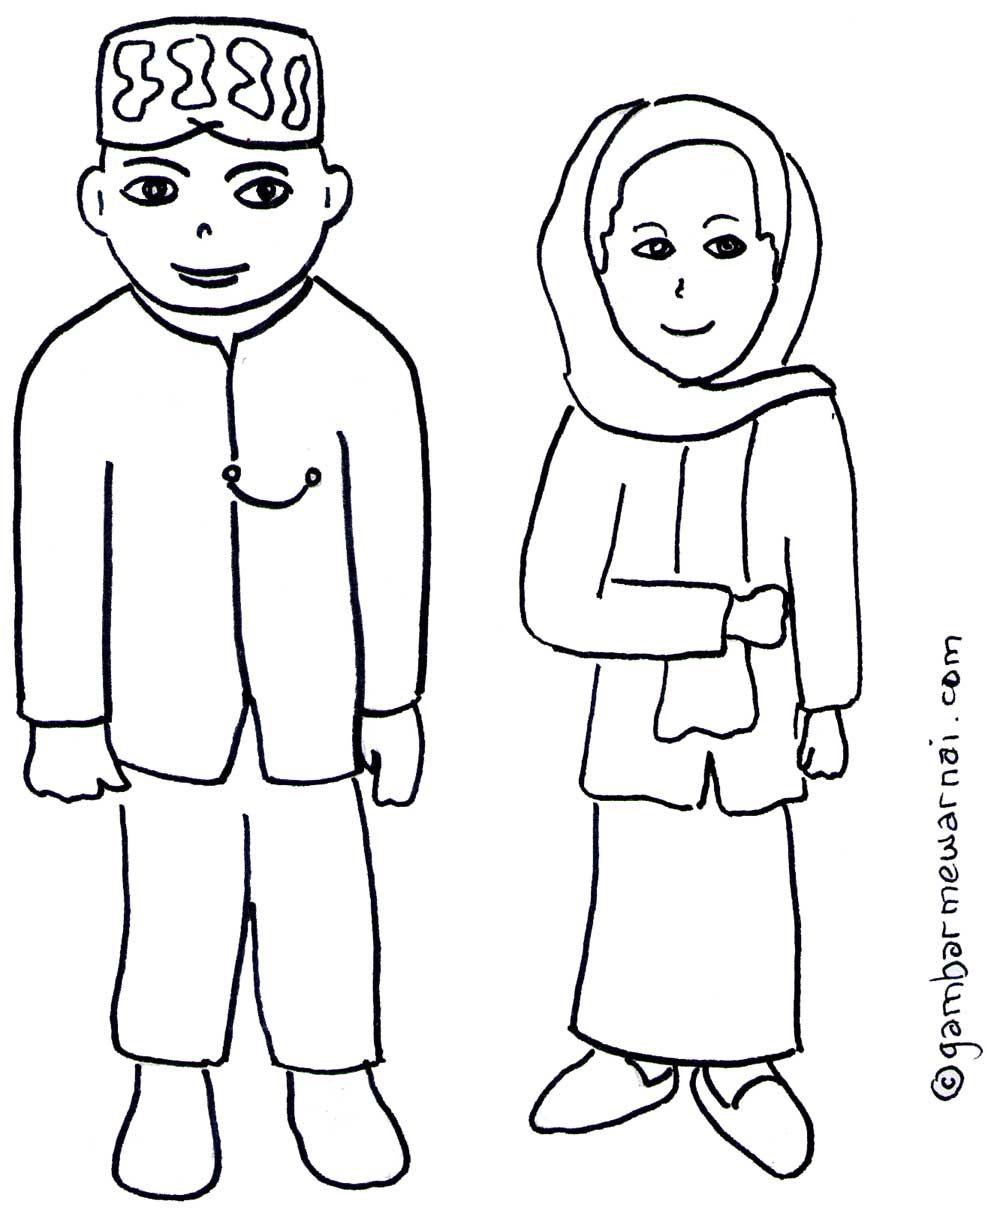 Mewarnai Pakaian Adat : mewarnai, pakaian, Gambar, Mewarnai, Pakaian, Betawi, Kartun,, Gambar,, Kartun